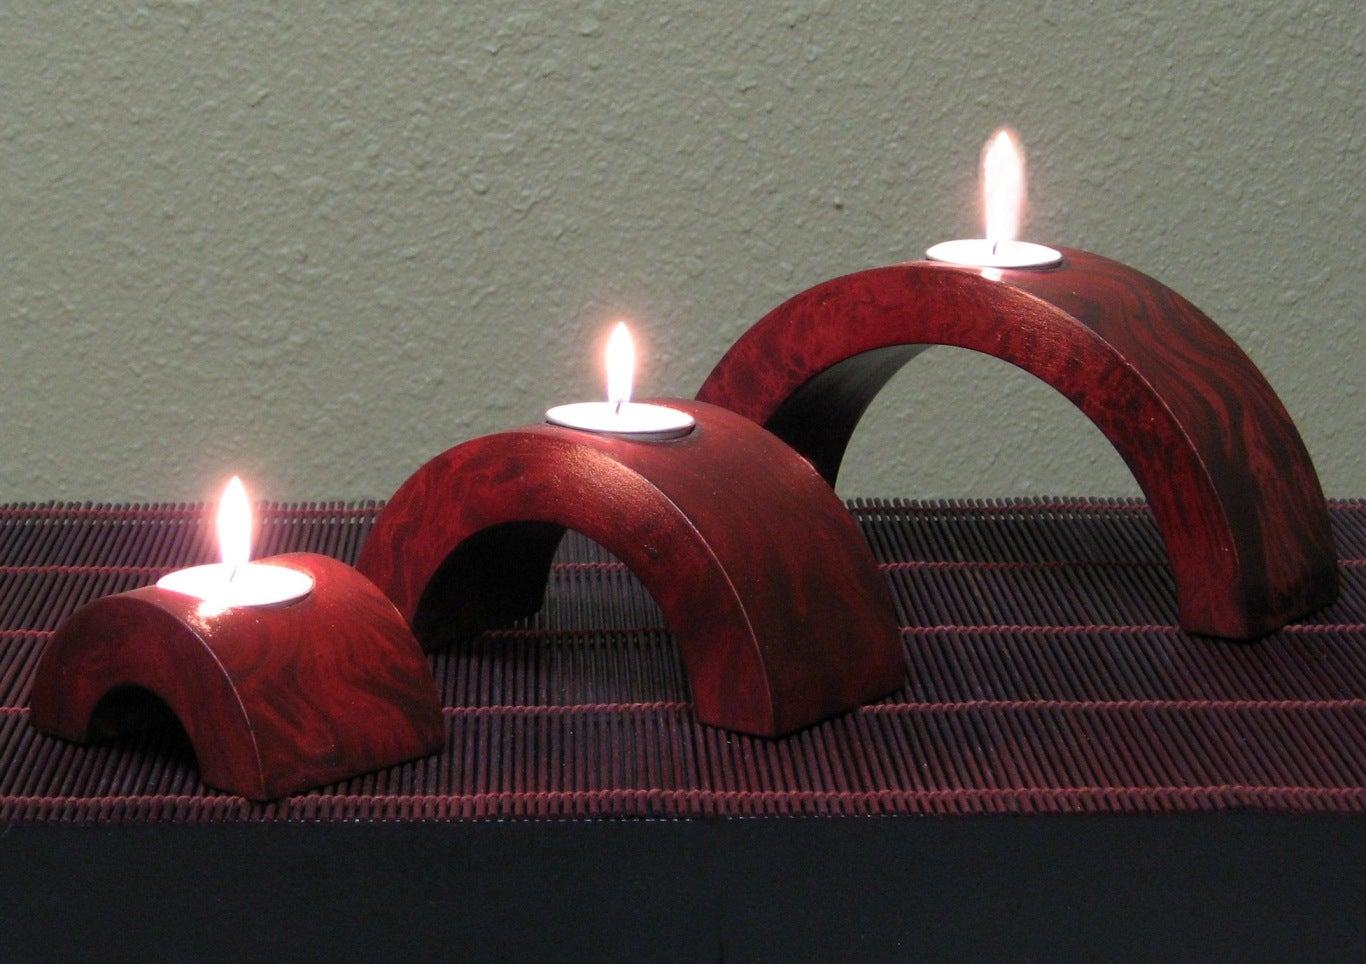 Arched Mango Wood Candle Holders (Set of 6) - Thumbnail 1